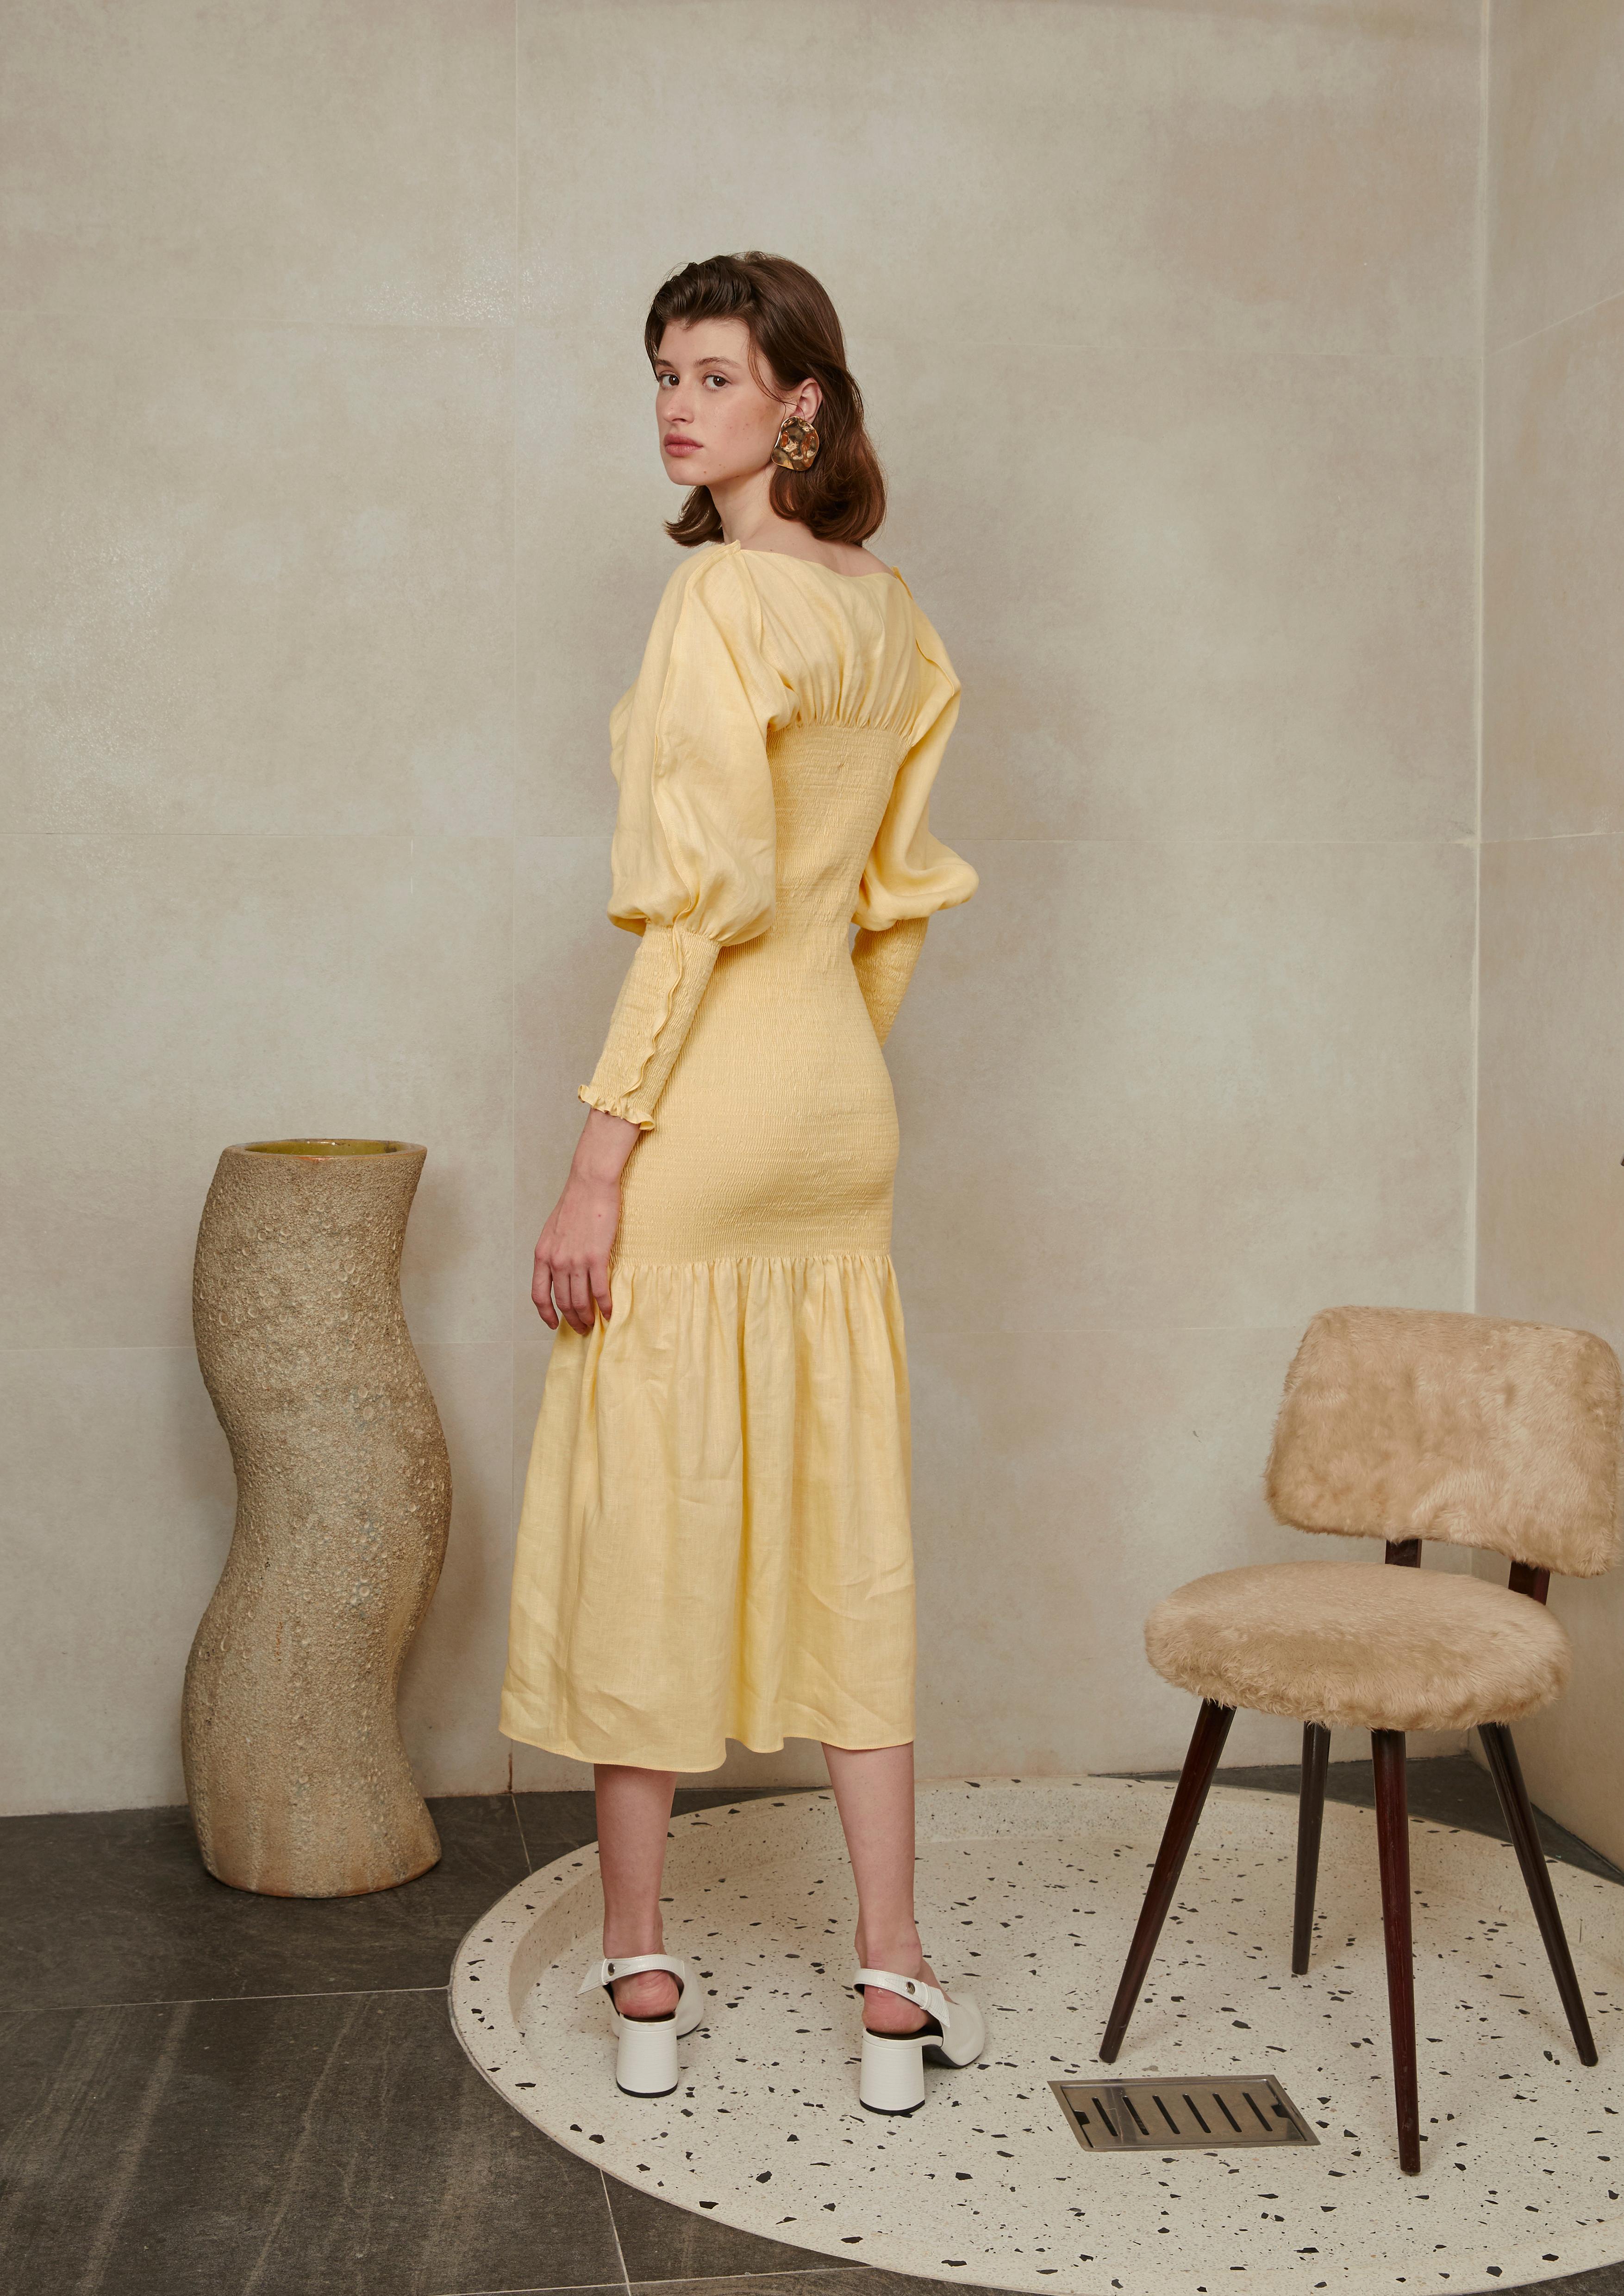 Rachel Dress by Voranida on curated-crowd.com